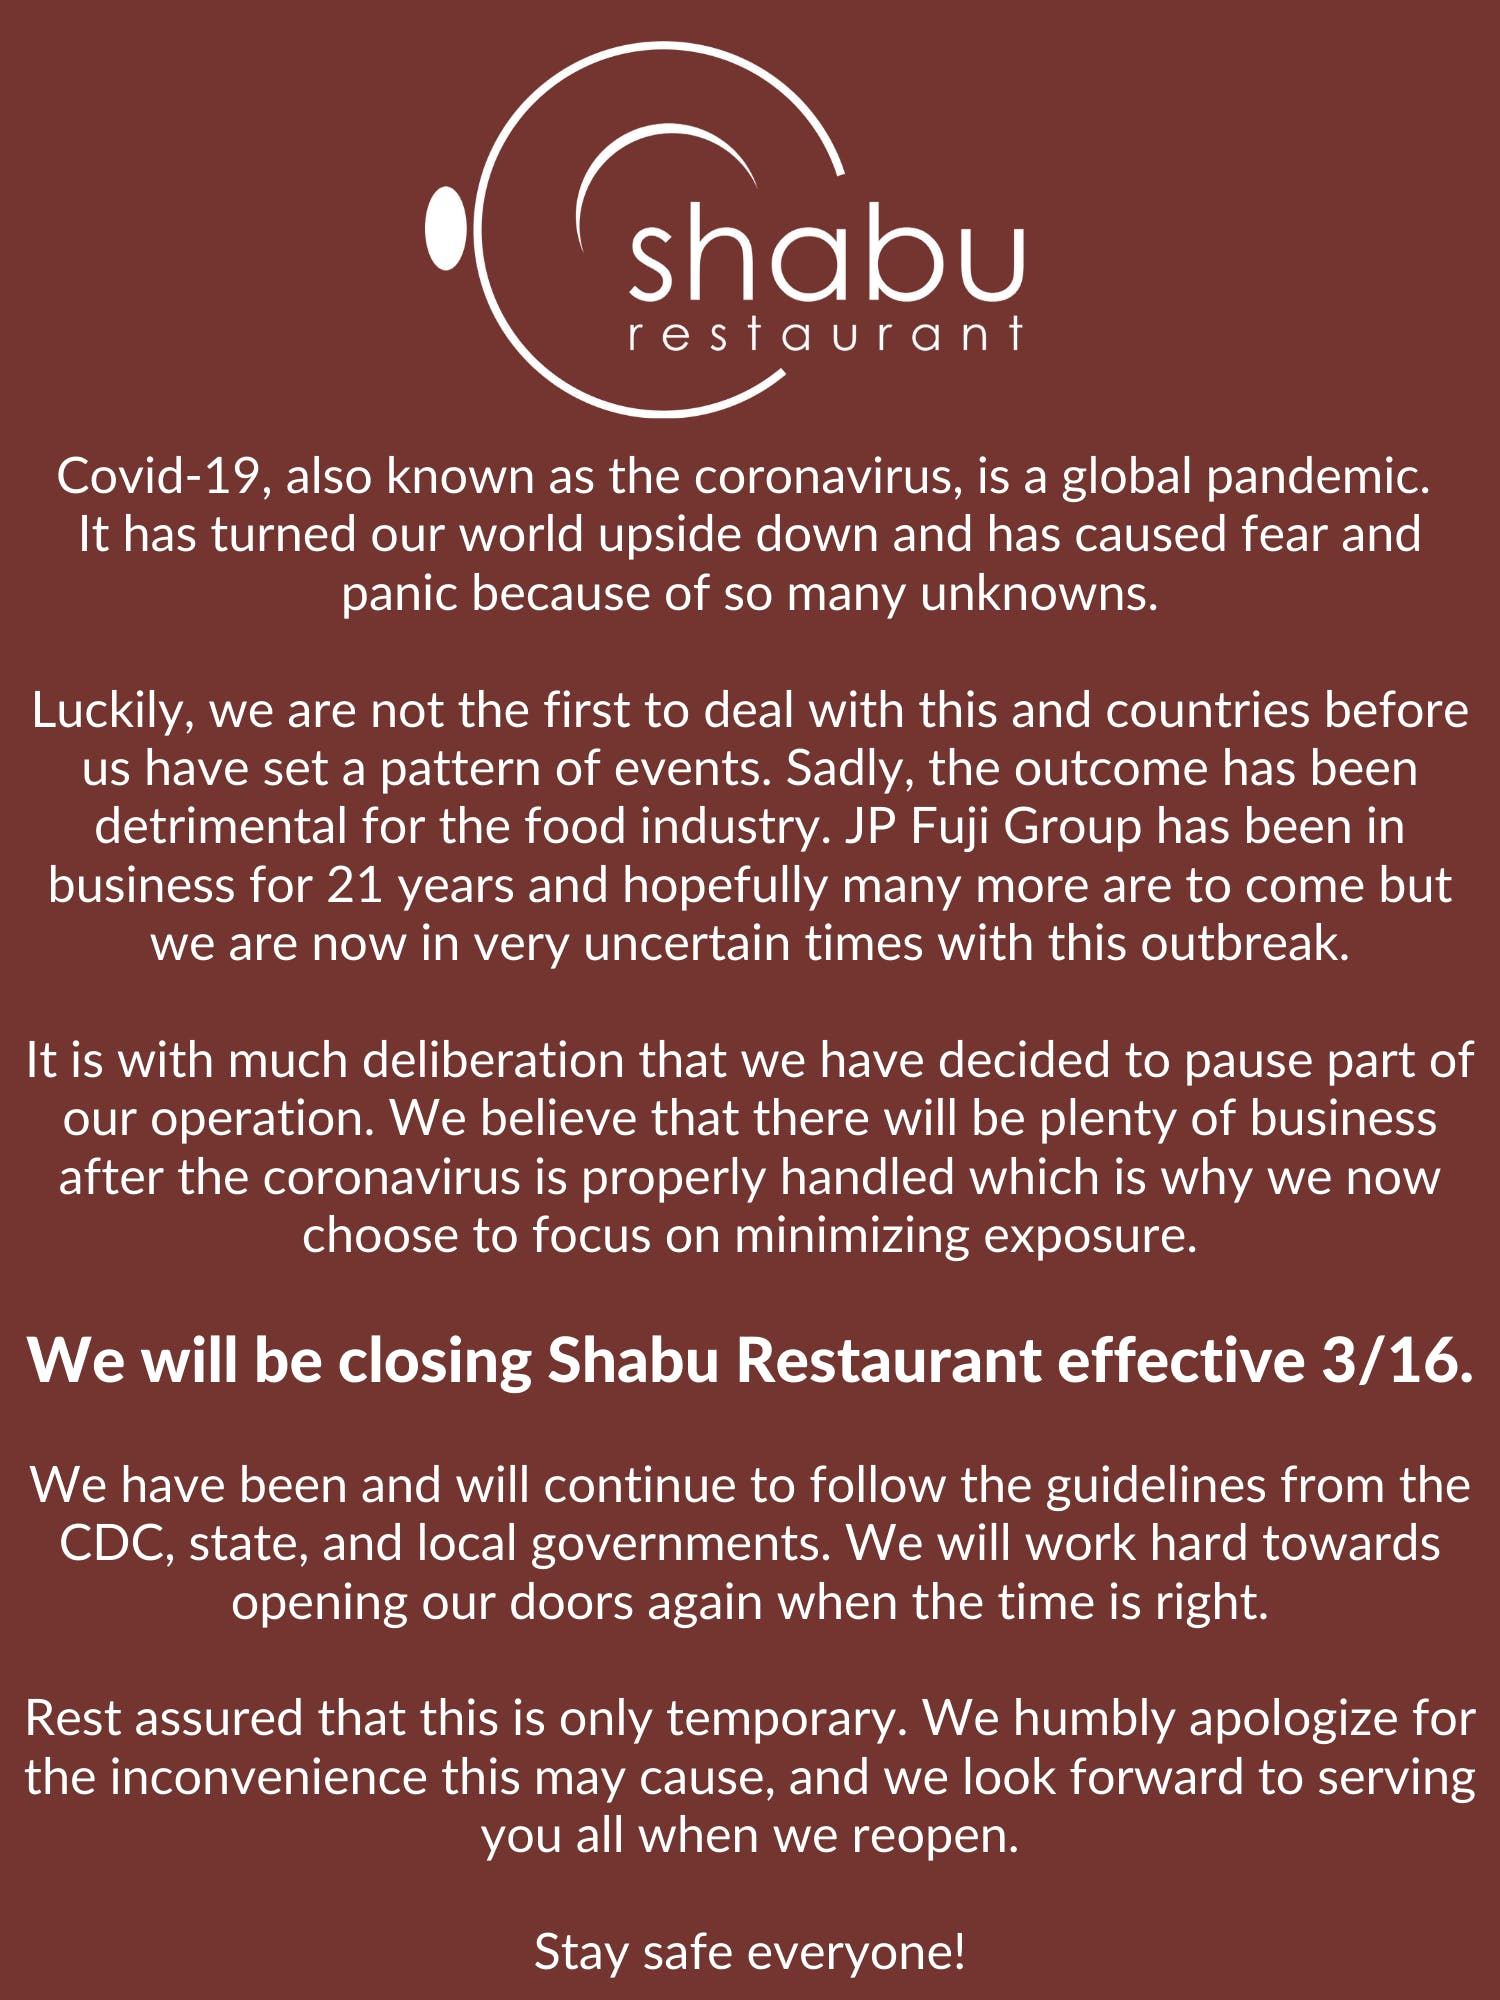 Shabu Restaurant will be closed due to the Coronavirus pandemic. Stay safe everyone!